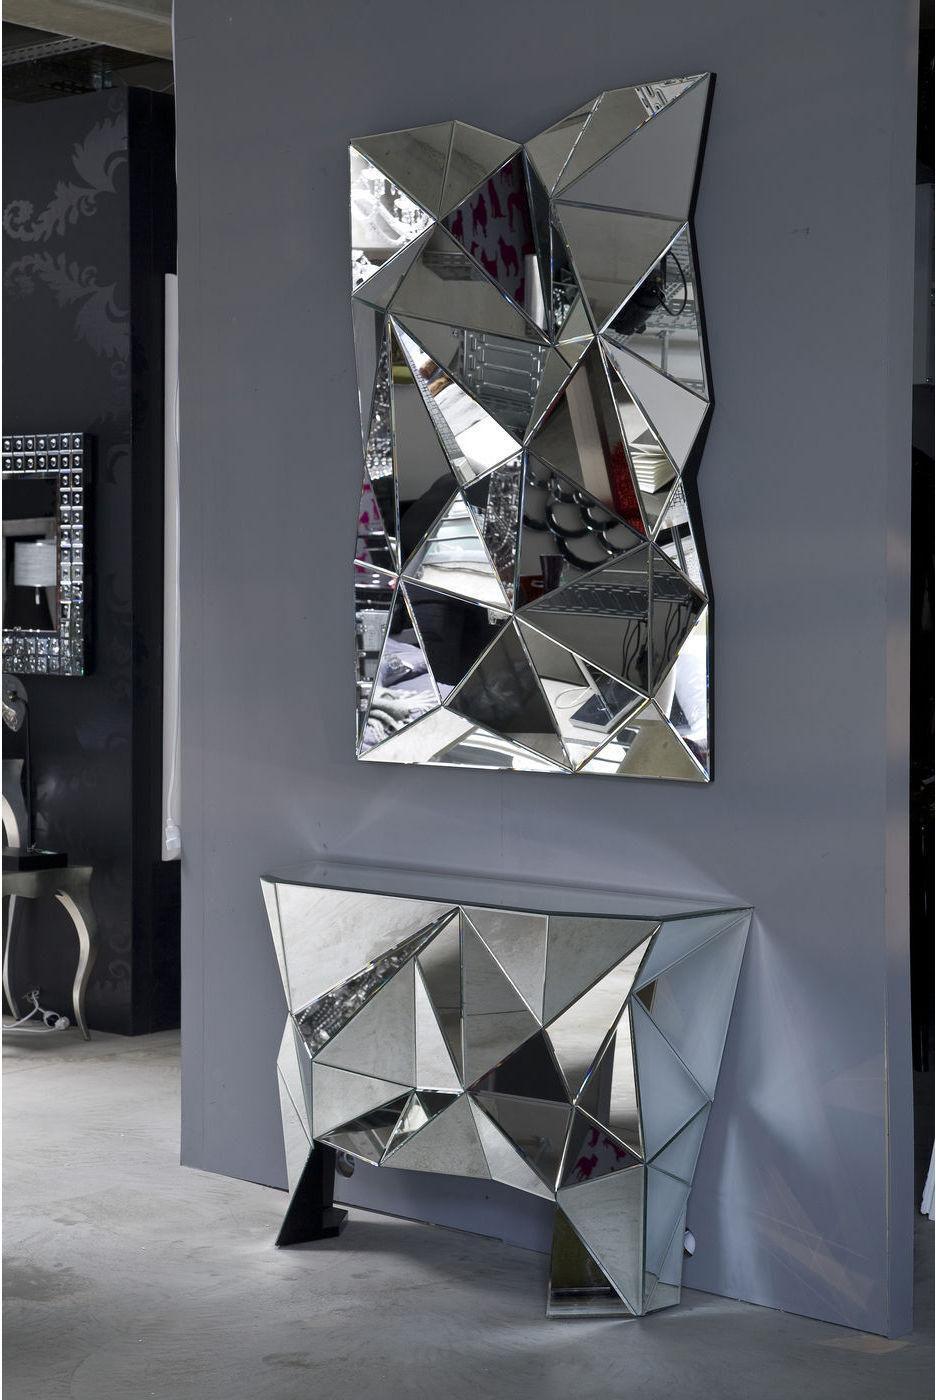 kare design spiegel prisma 120x80cm meubelen verlichting. Black Bedroom Furniture Sets. Home Design Ideas